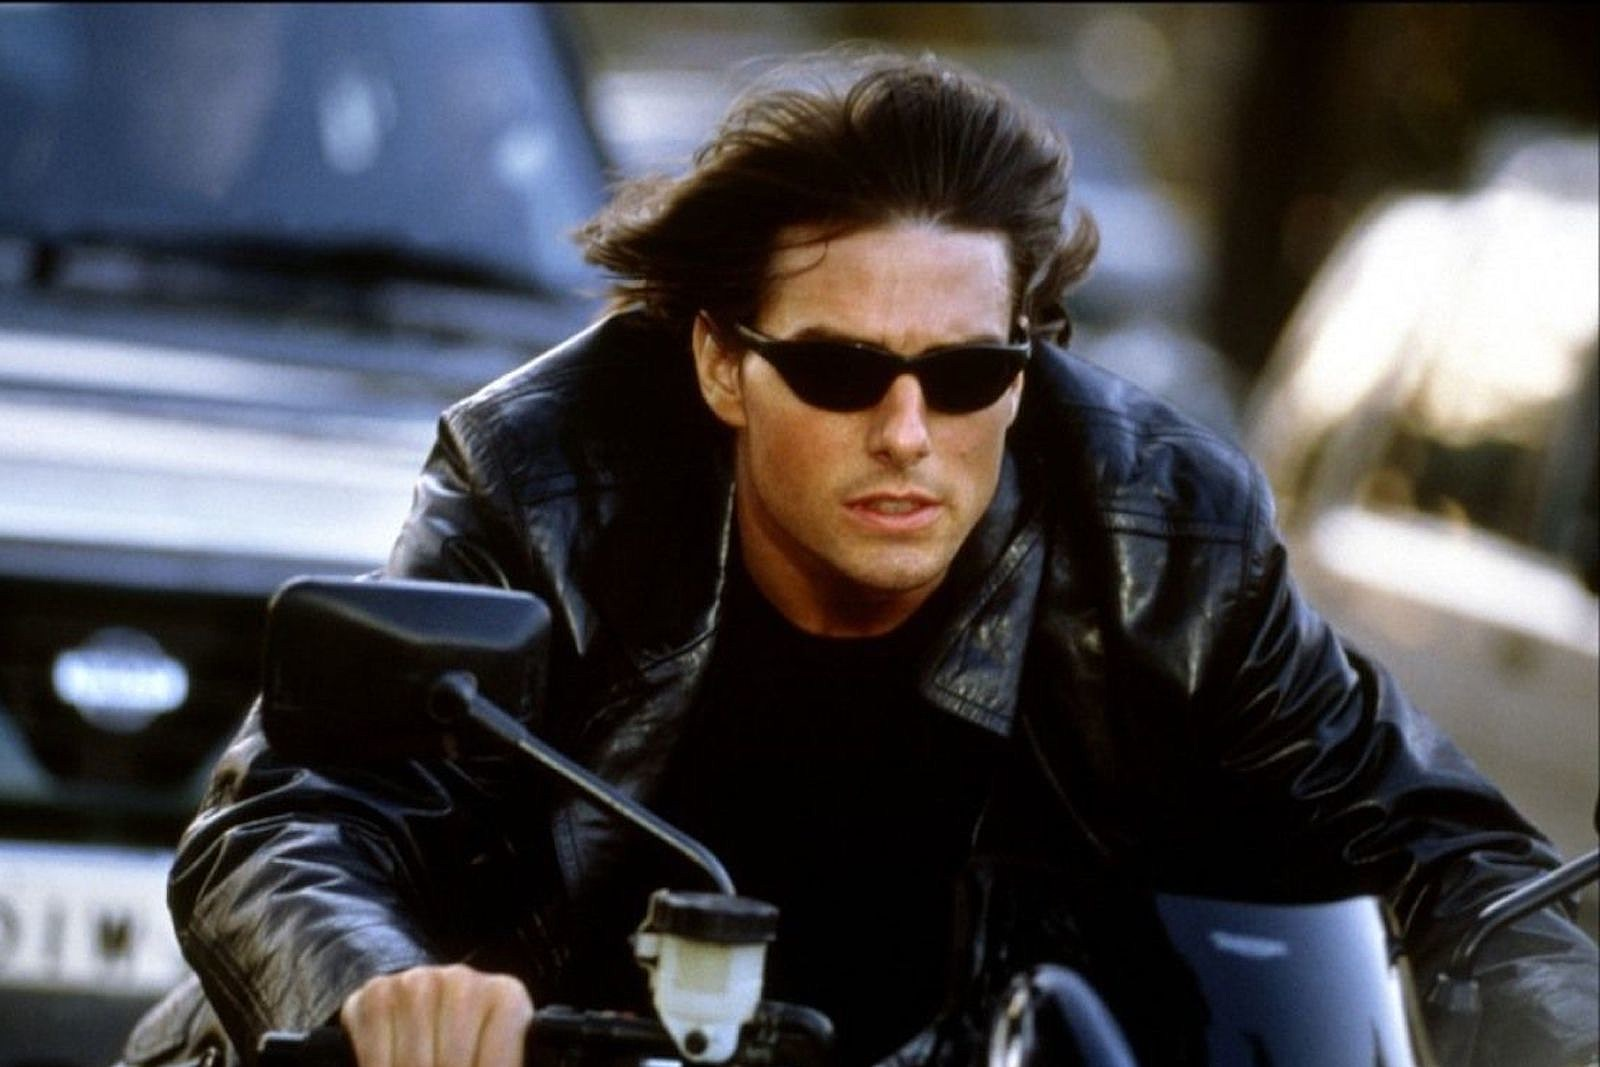 Mission Impossible II | Highest Grossing Film 2000 | Popcorn Banter